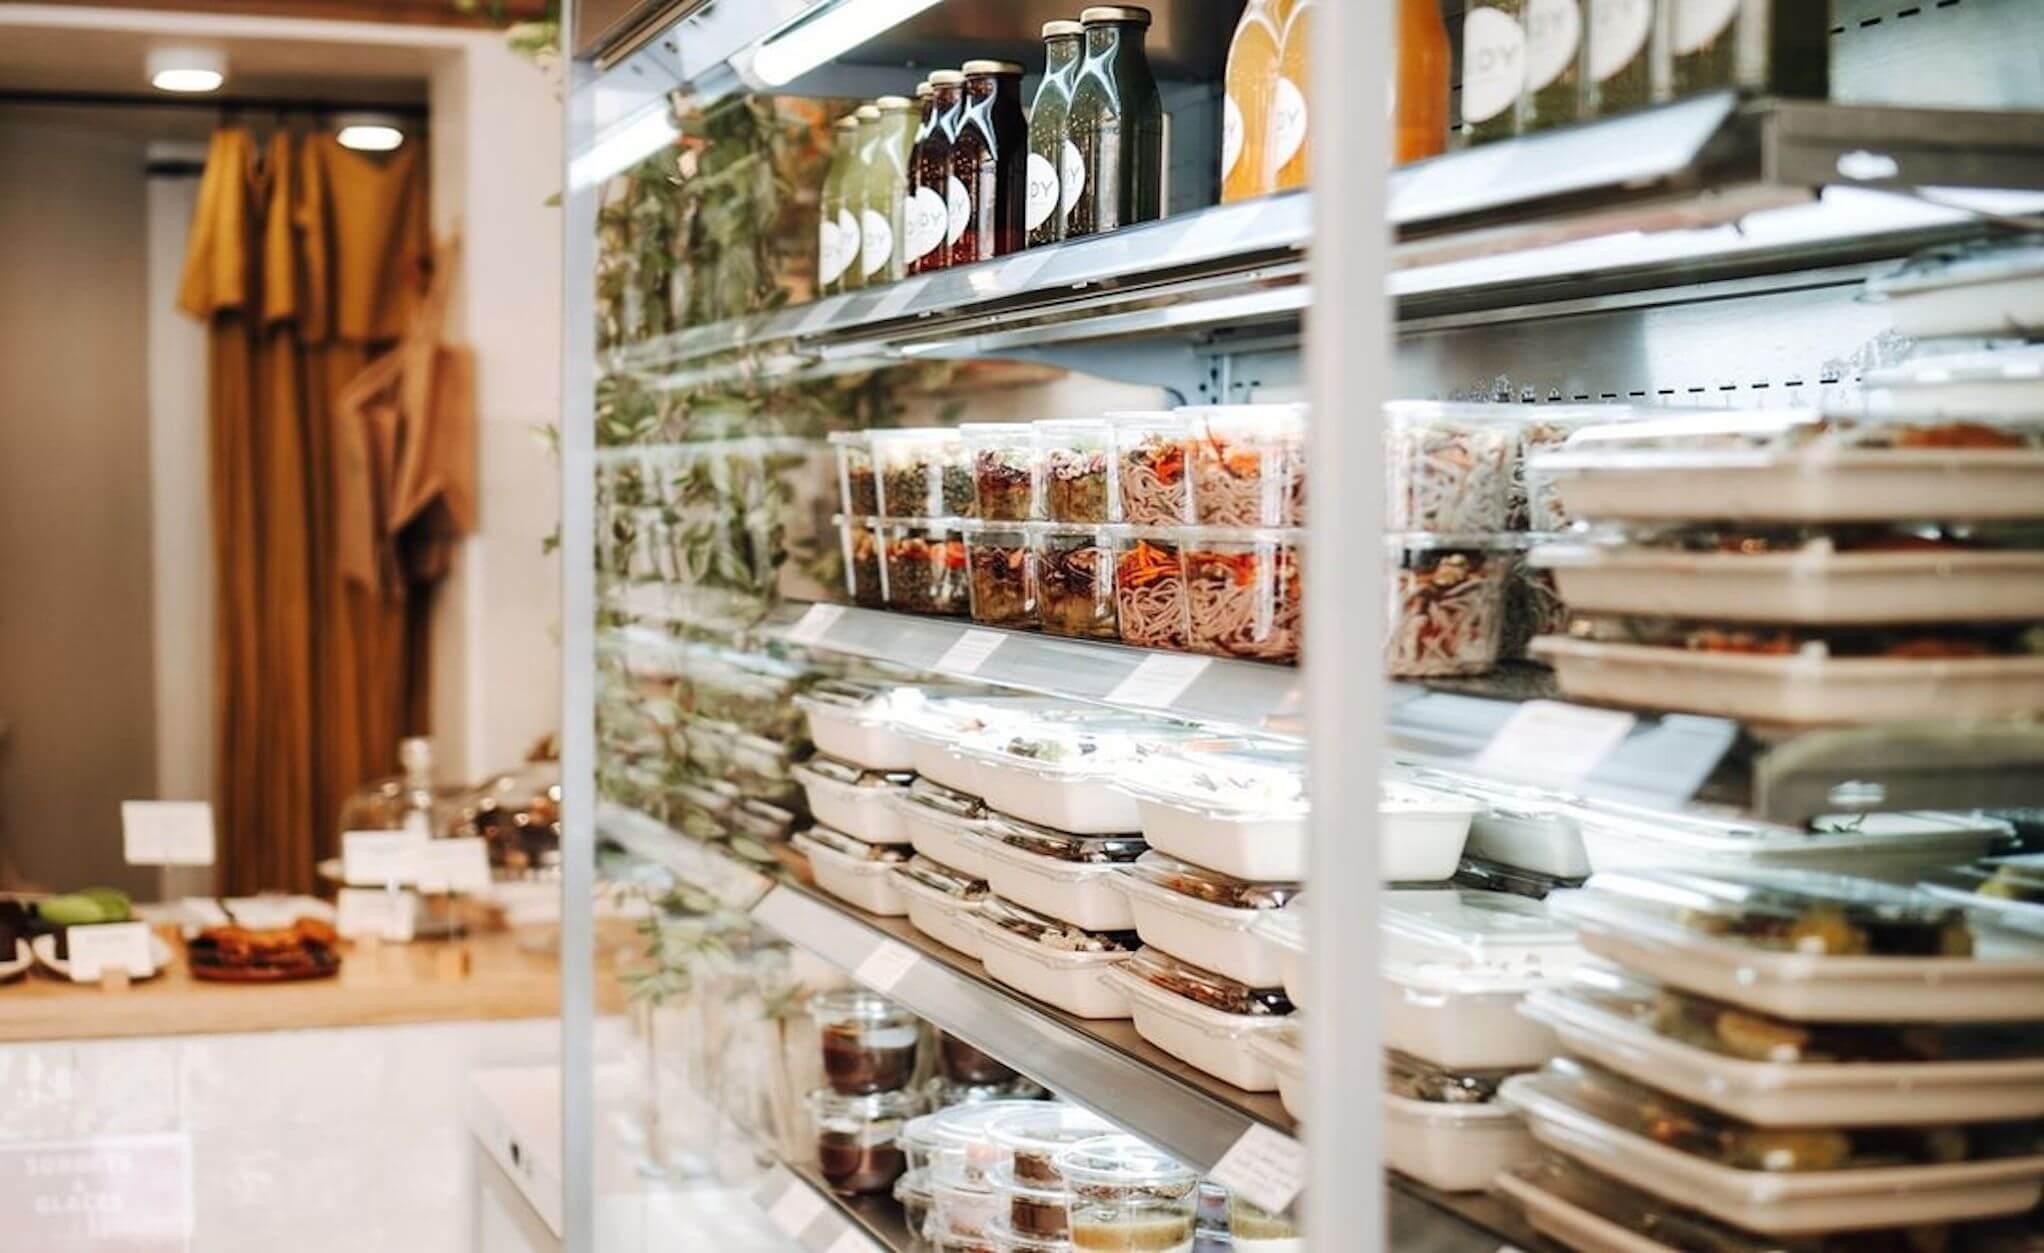 vente a emporter restaurants france